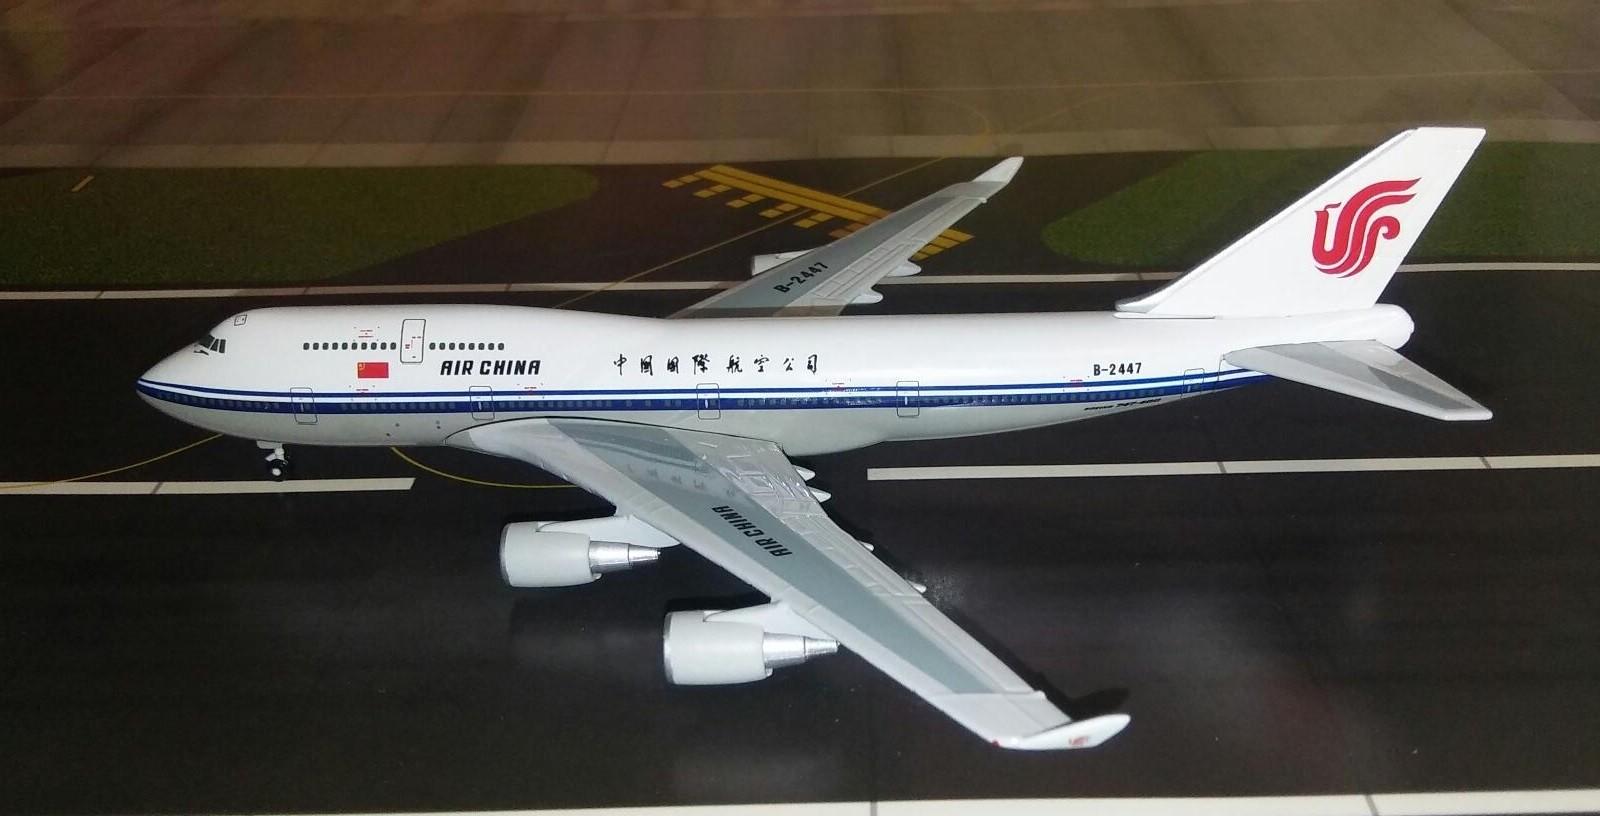 Air China Boeing 747-4J6 B-2447 Gemini Jets GJCCA005 scale 1